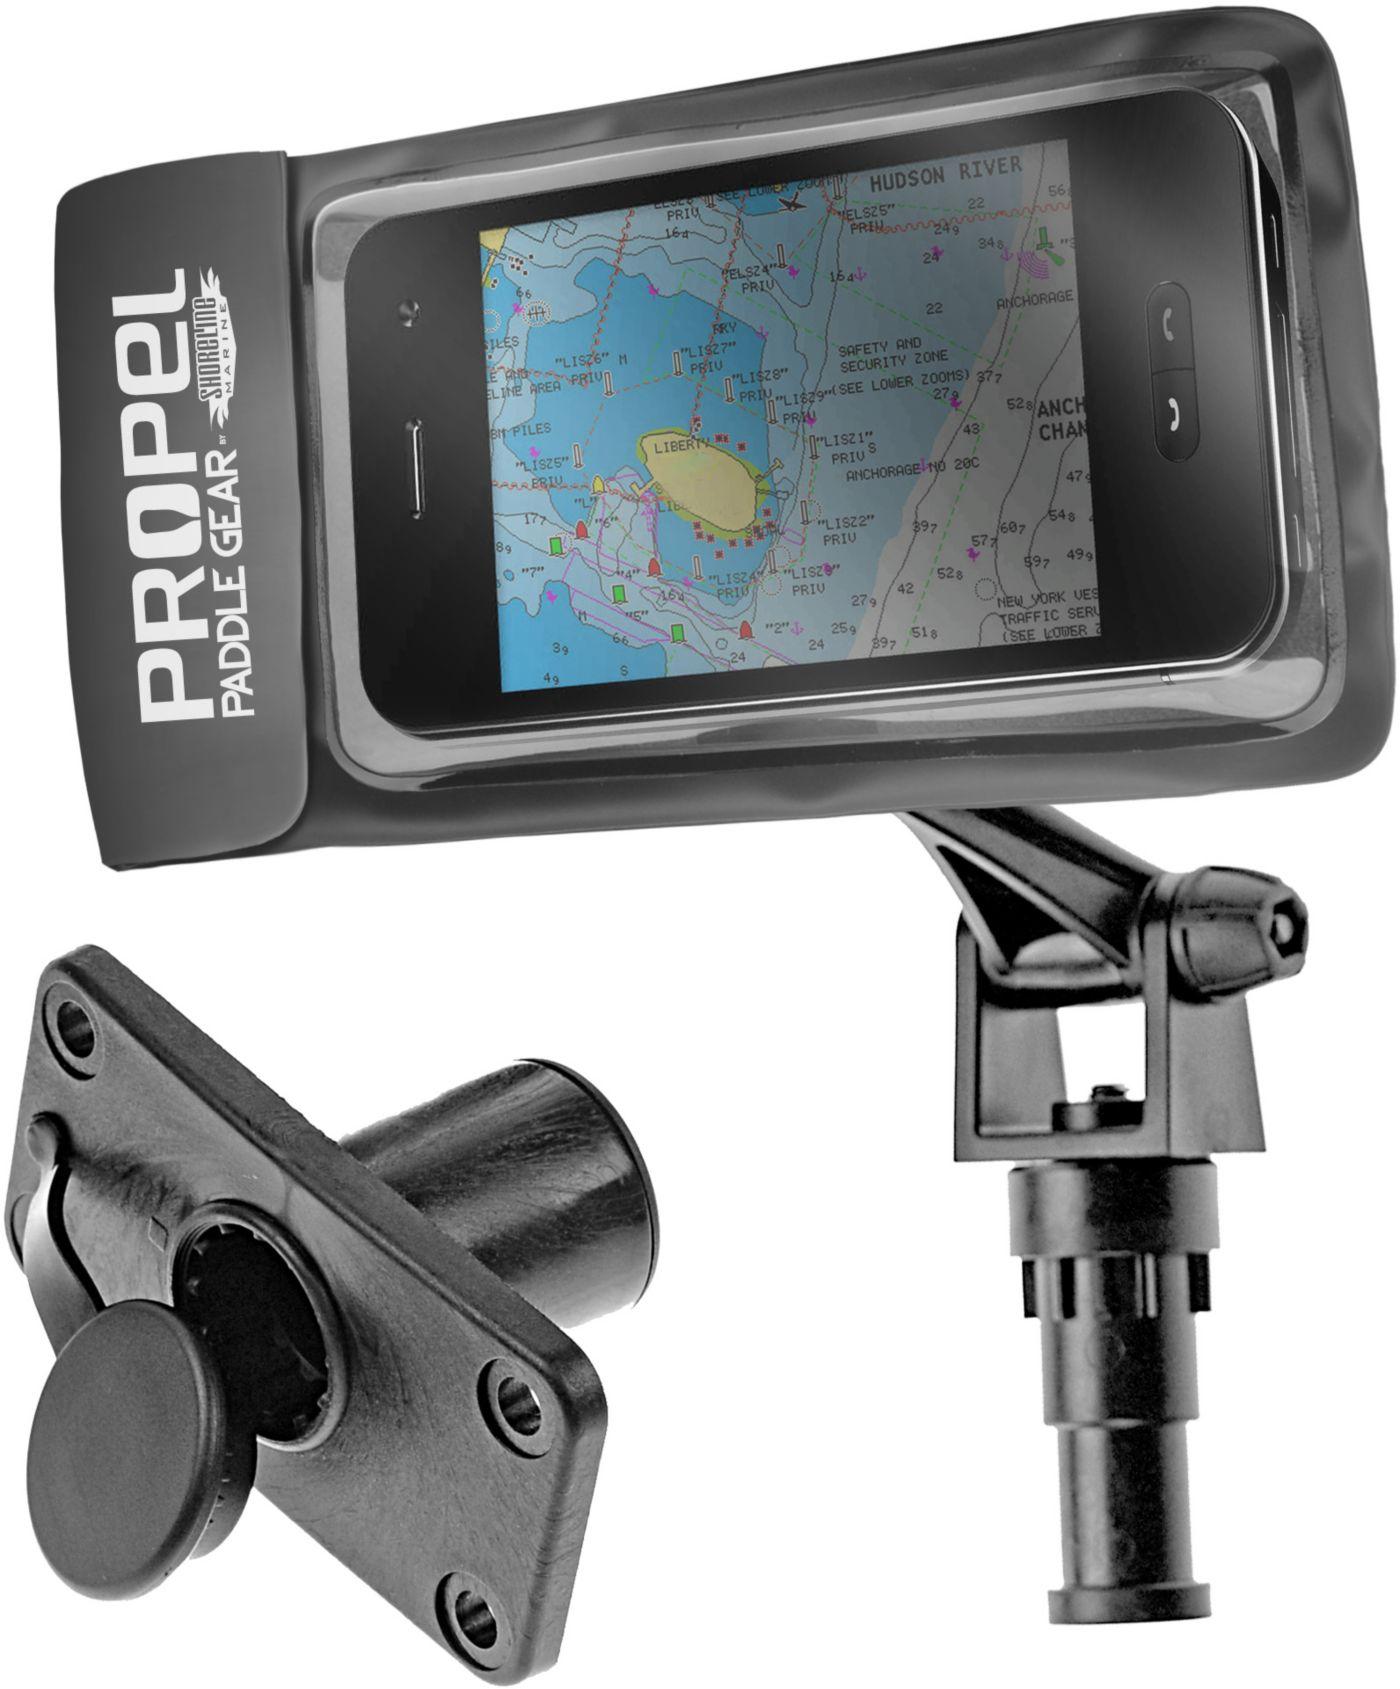 Propel Universal GPS/Phone Mount